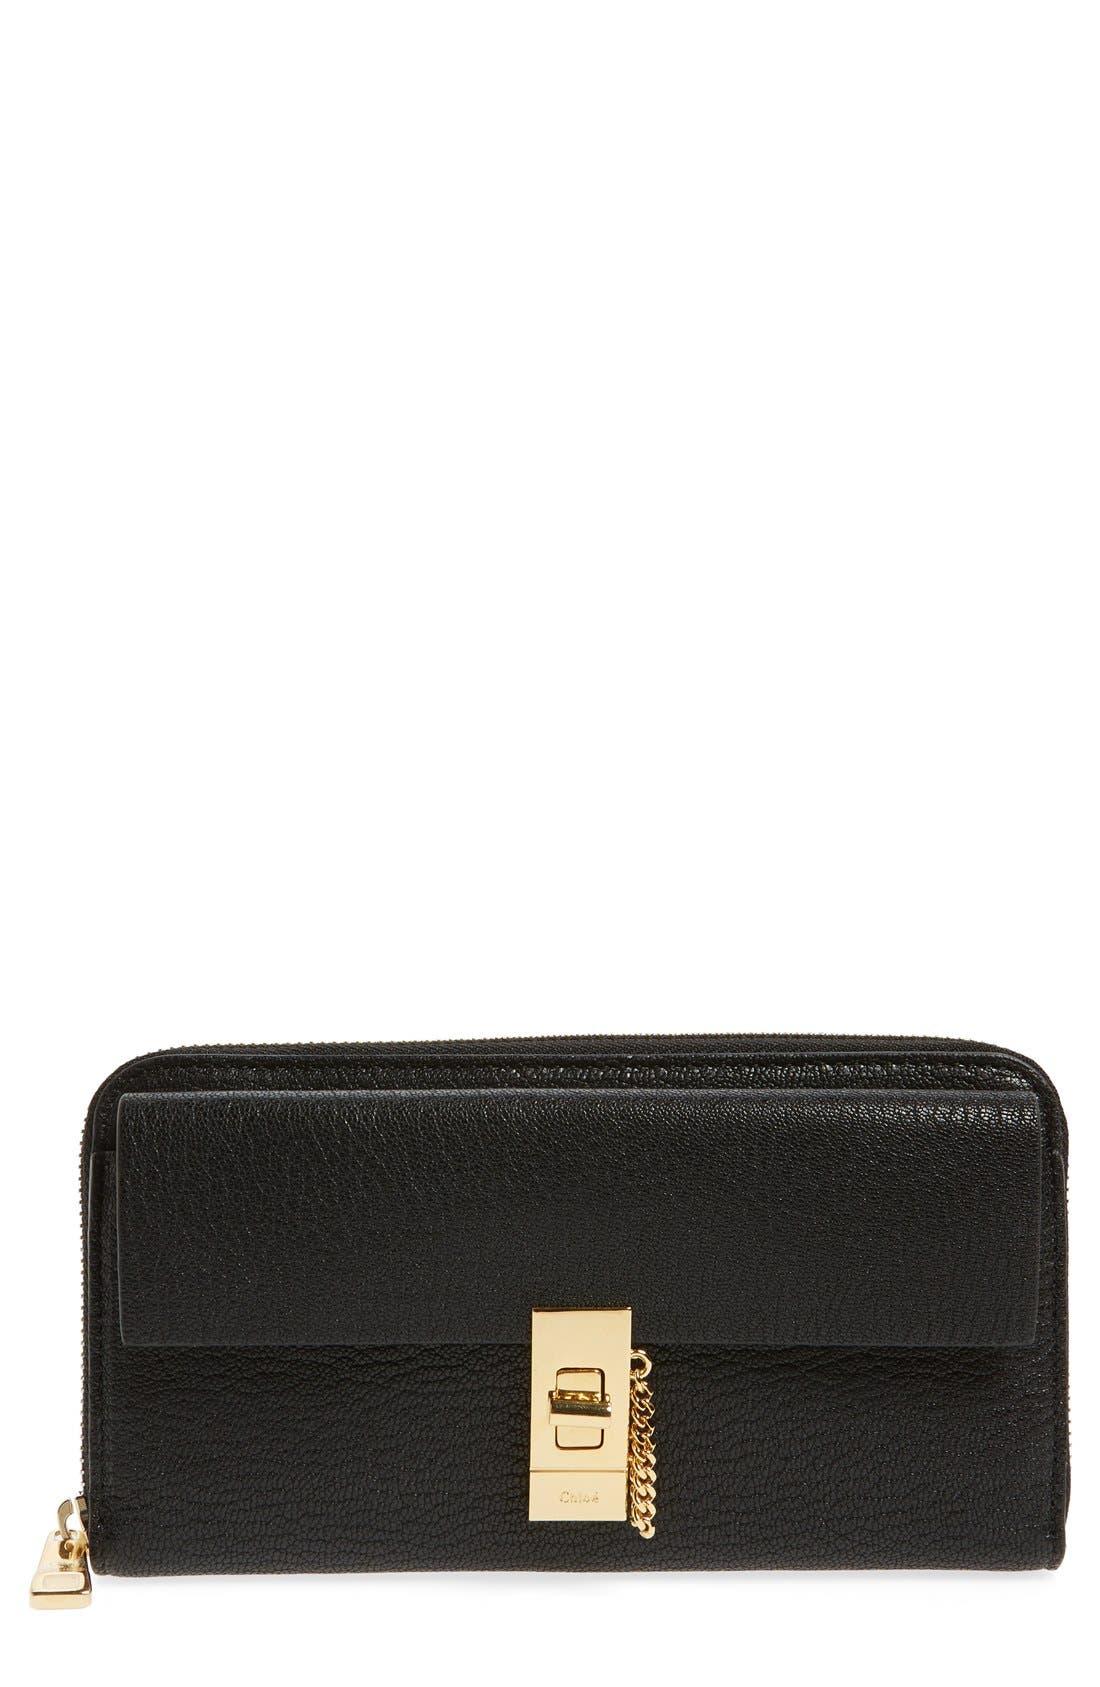 'Drew' Calfskin Leather Zip Around Wallet,                         Main,                         color, Black